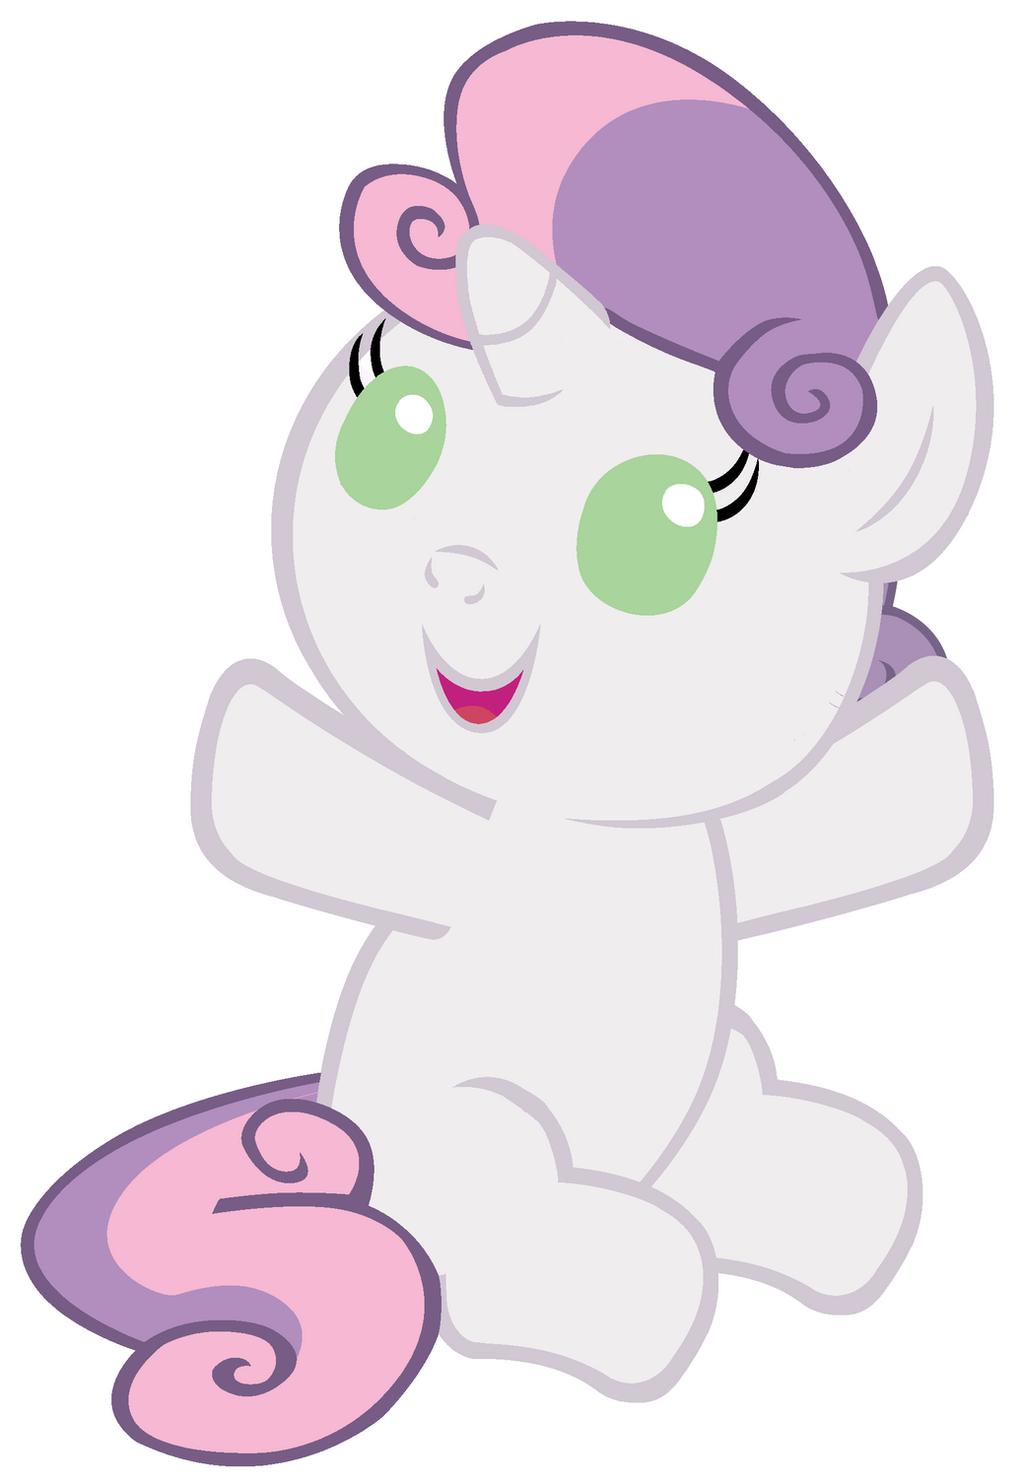 My little pony sweetie belle baby - photo#2